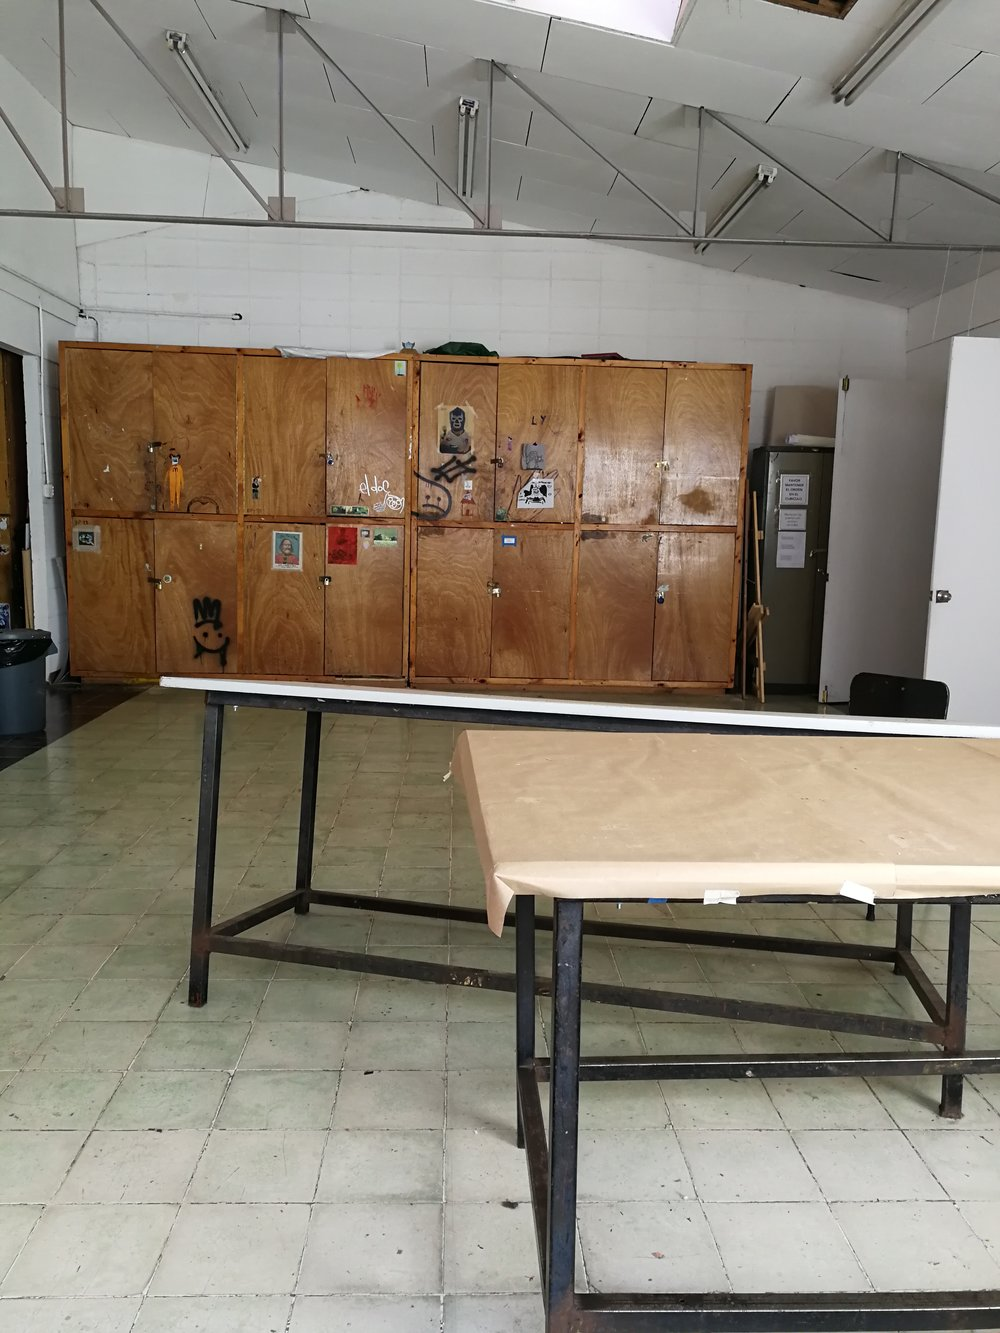 taller de pintura, la EAP